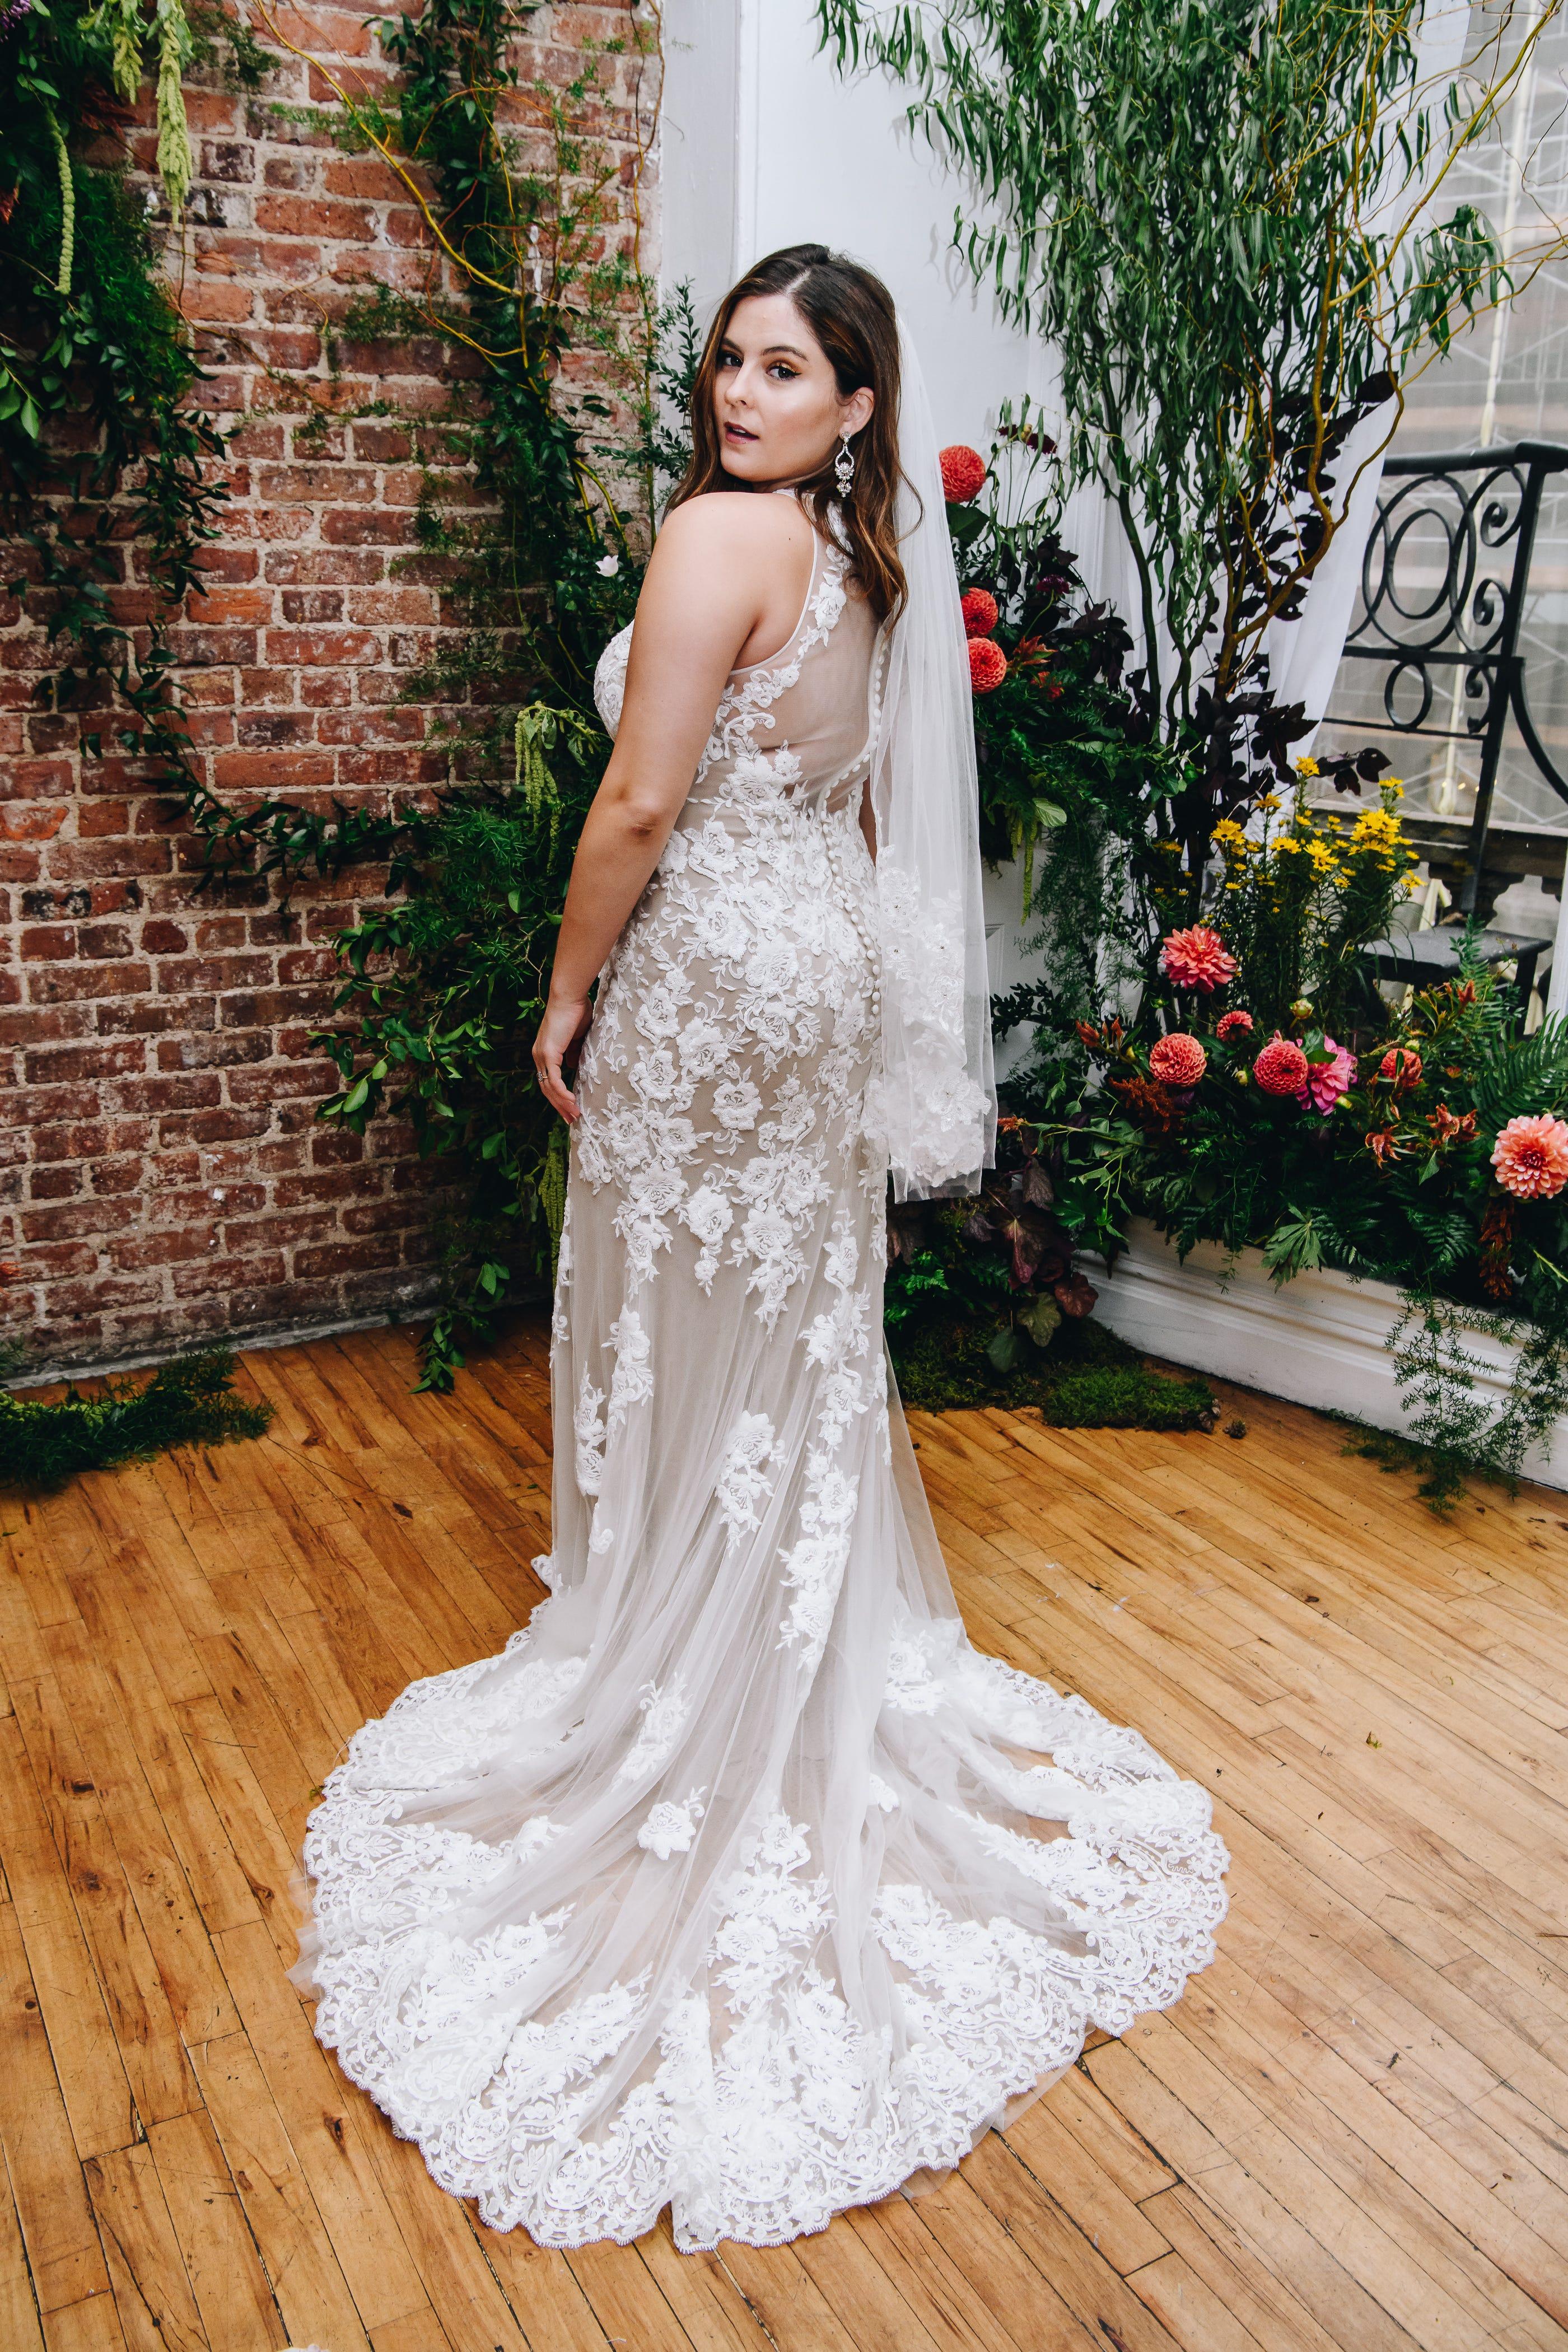 Wedding Dress Chain David S Bridal Plans Big Changes After Bankruptcy,Short Red Dress For Wedding